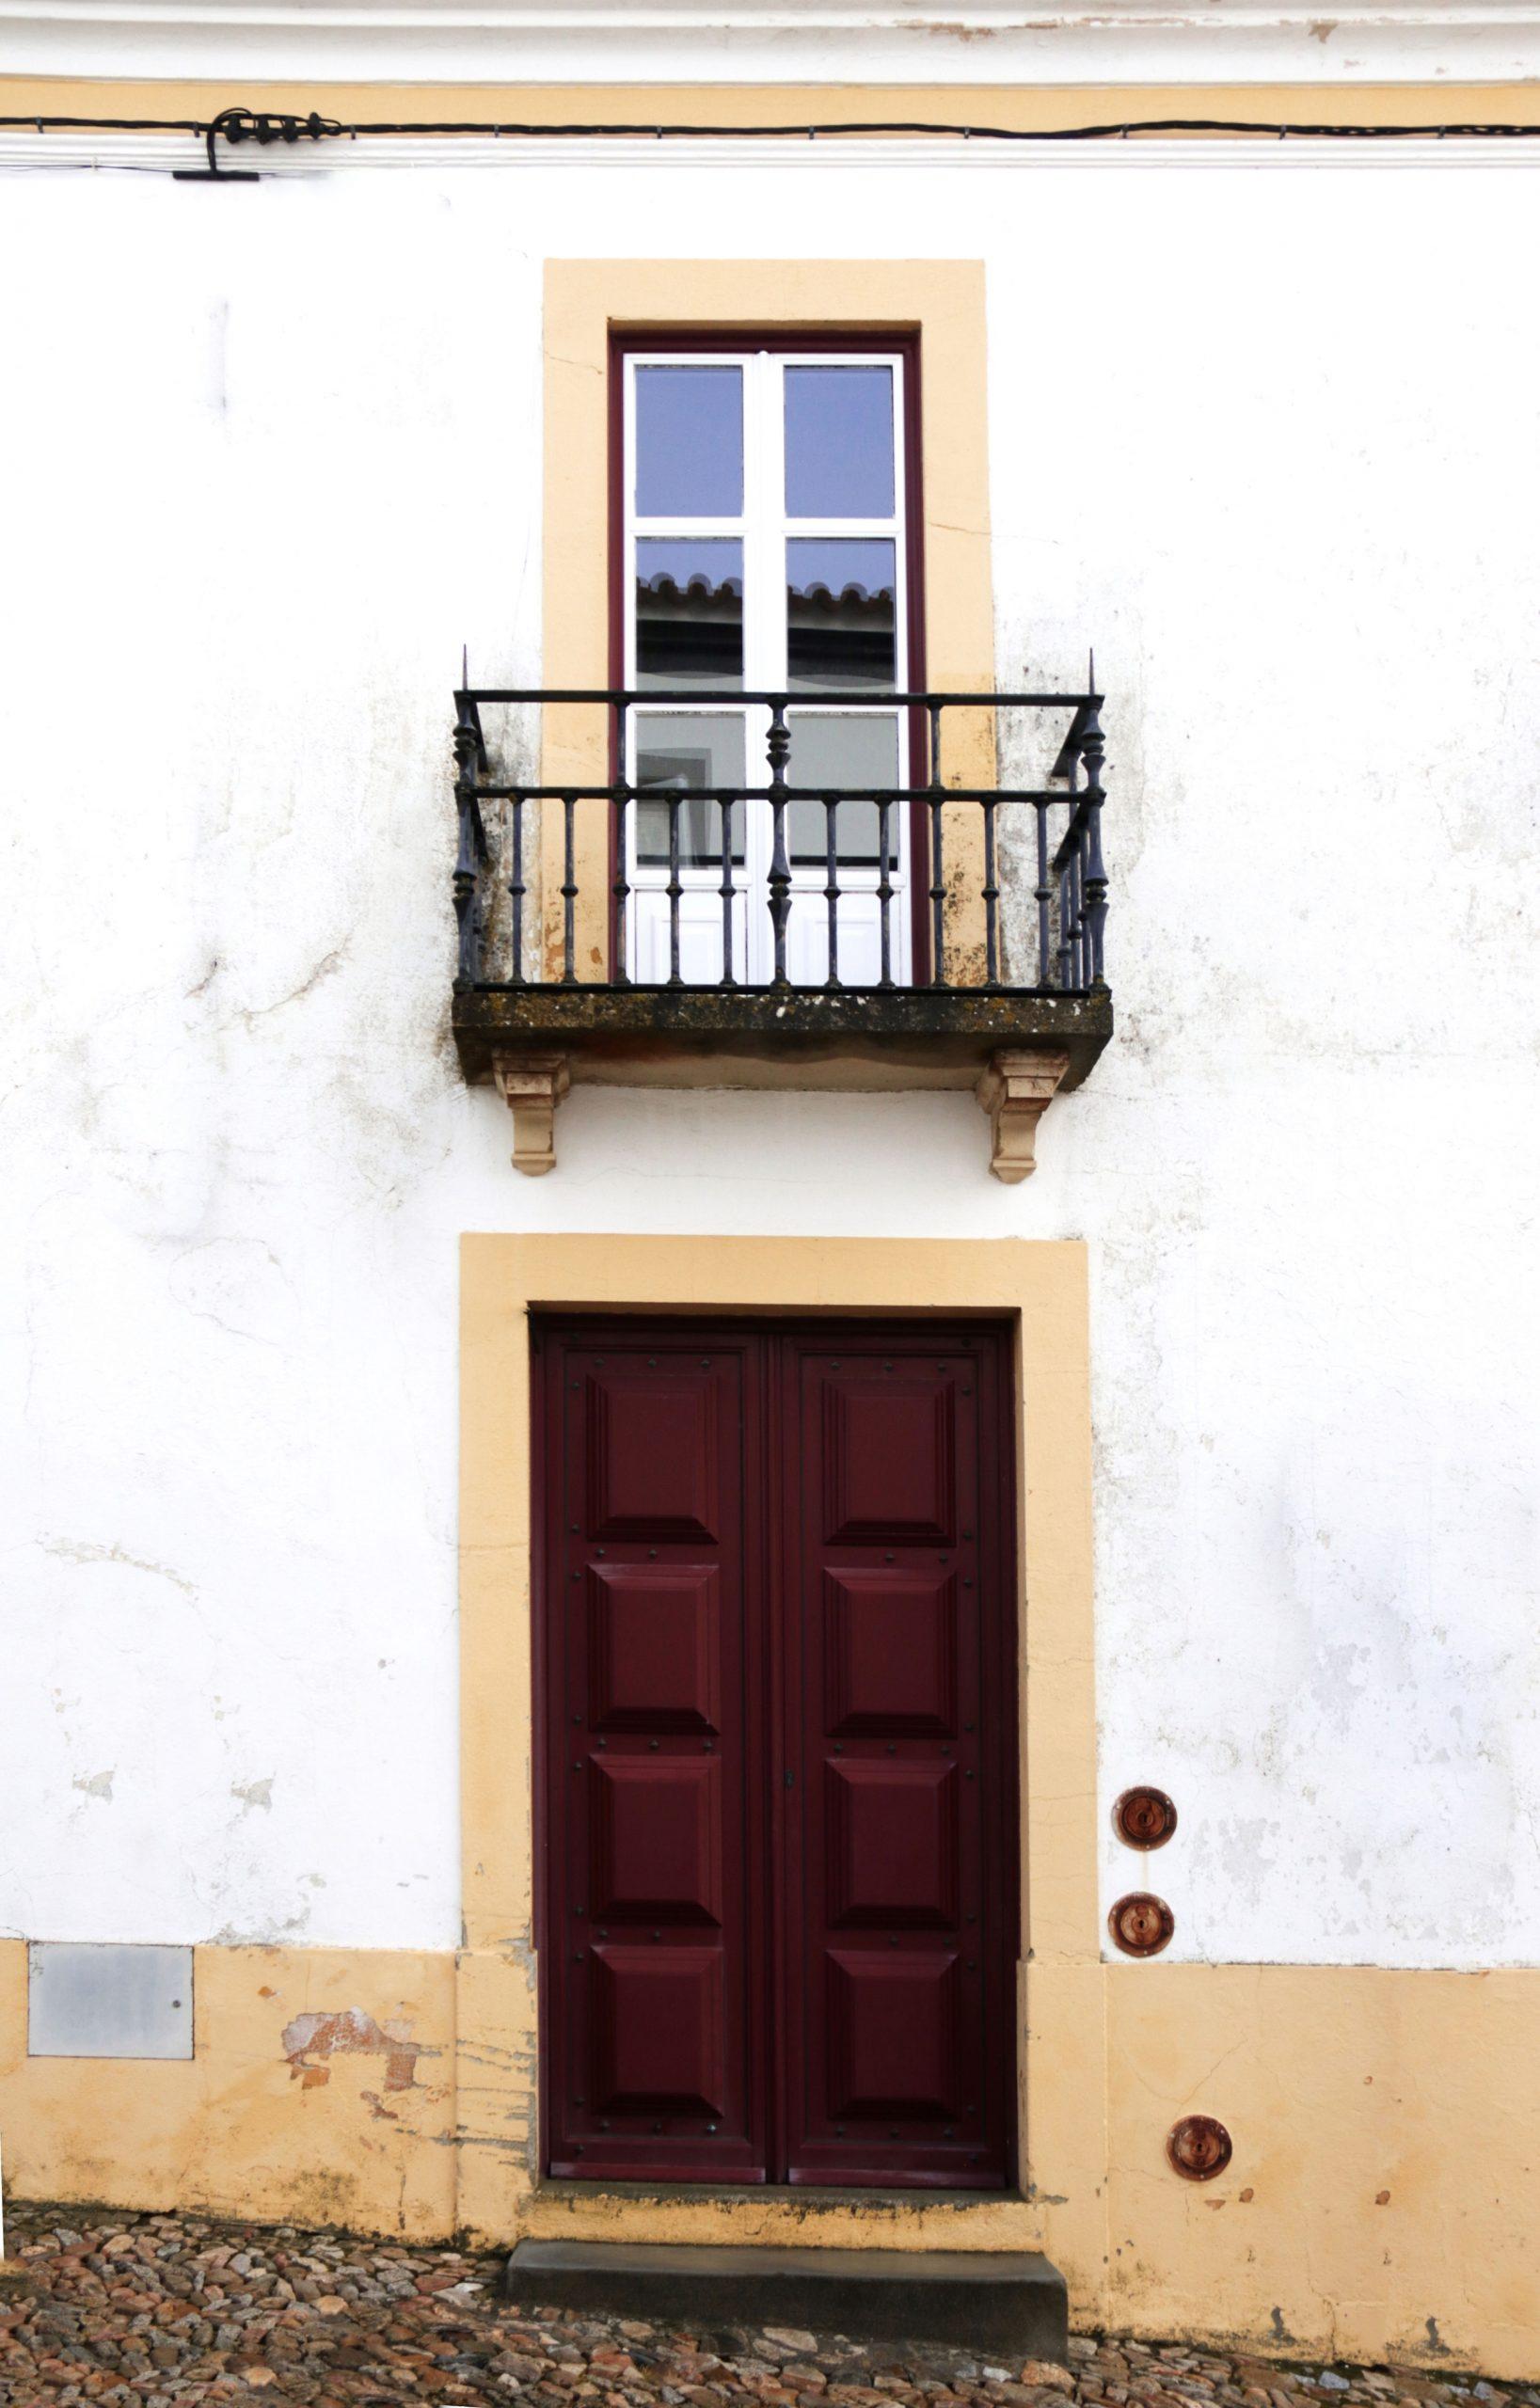 Janela do quarto onde pernoitou José Saramago (CMMN, 2019)